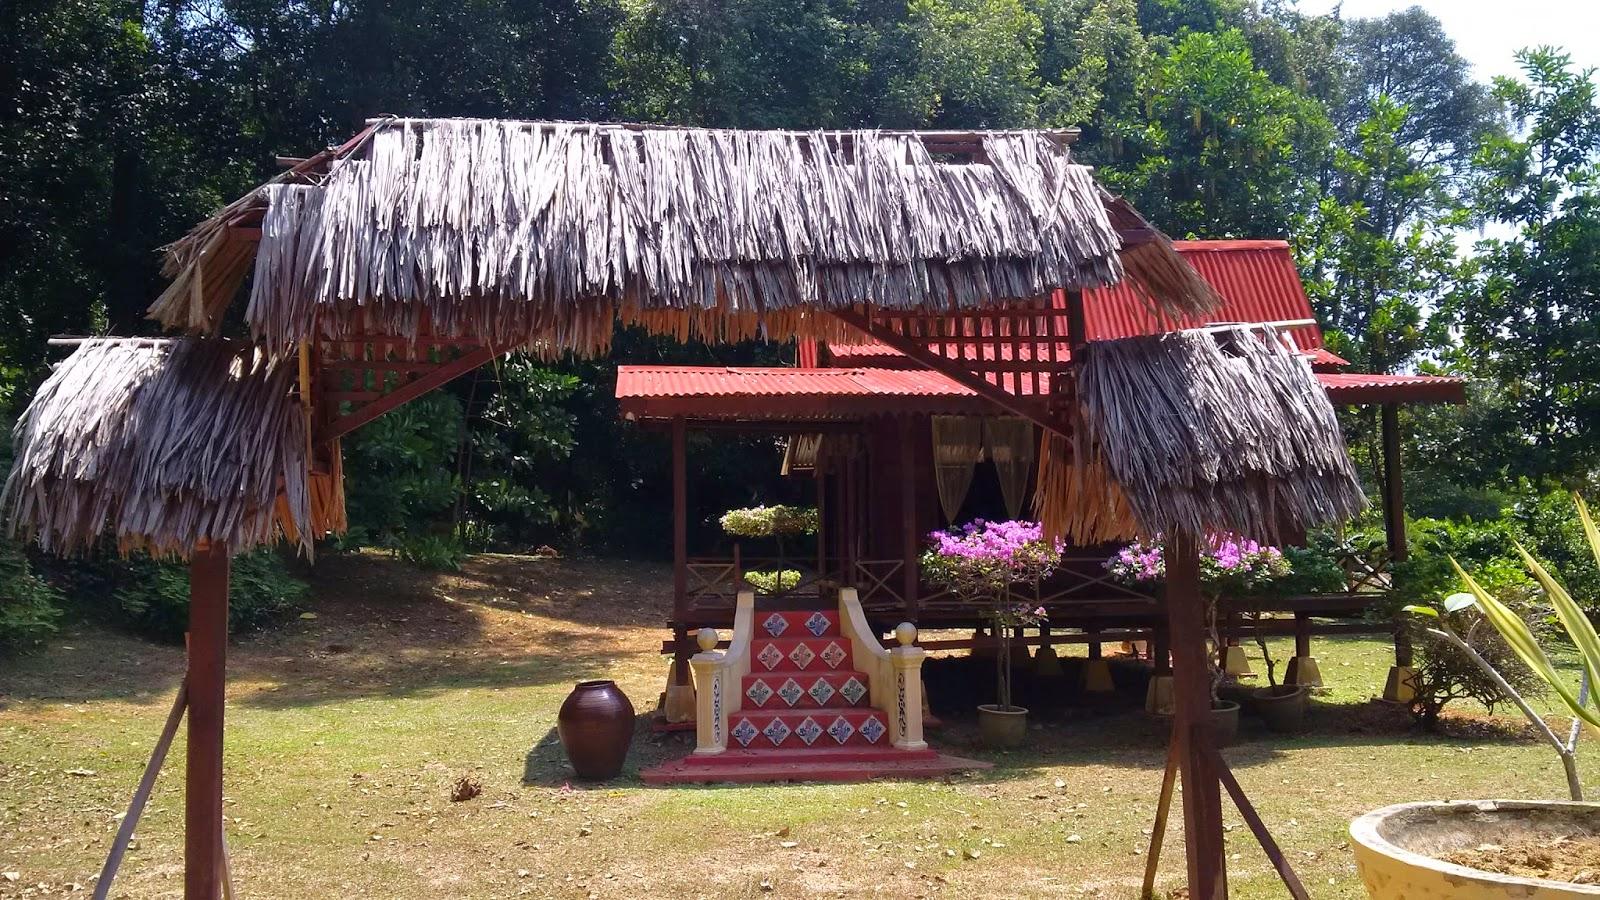 taman seribu bunga melaka, thousand flower garden, kompleks Seri Negeri, orkid, flowers melaka, trees, malaysian herbs.